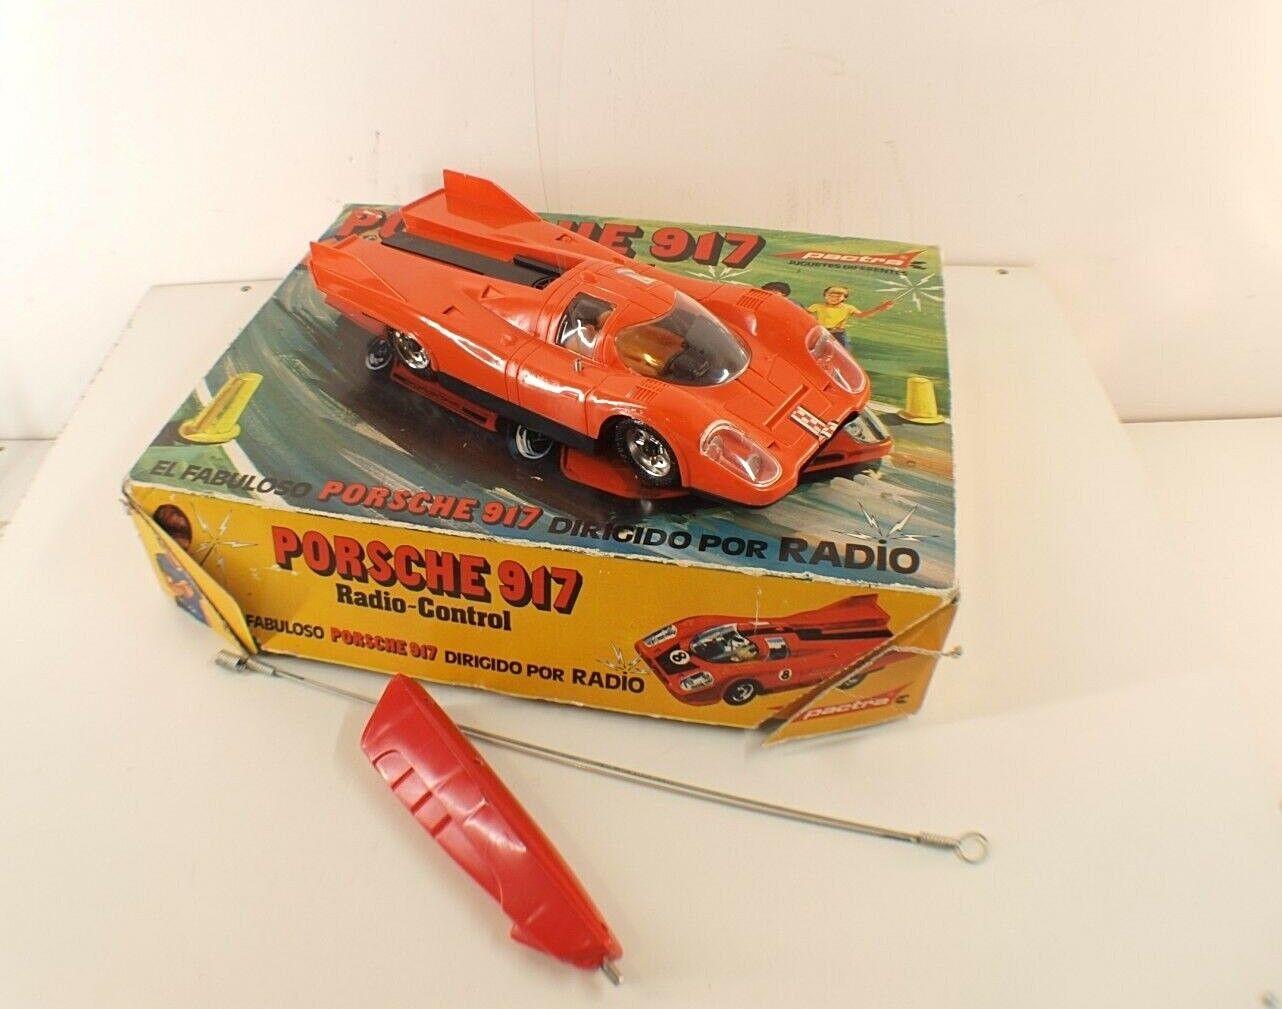 PACTRA Spain n° 745 Porsche 917 radio contol radiocommandé ancien rare en boite